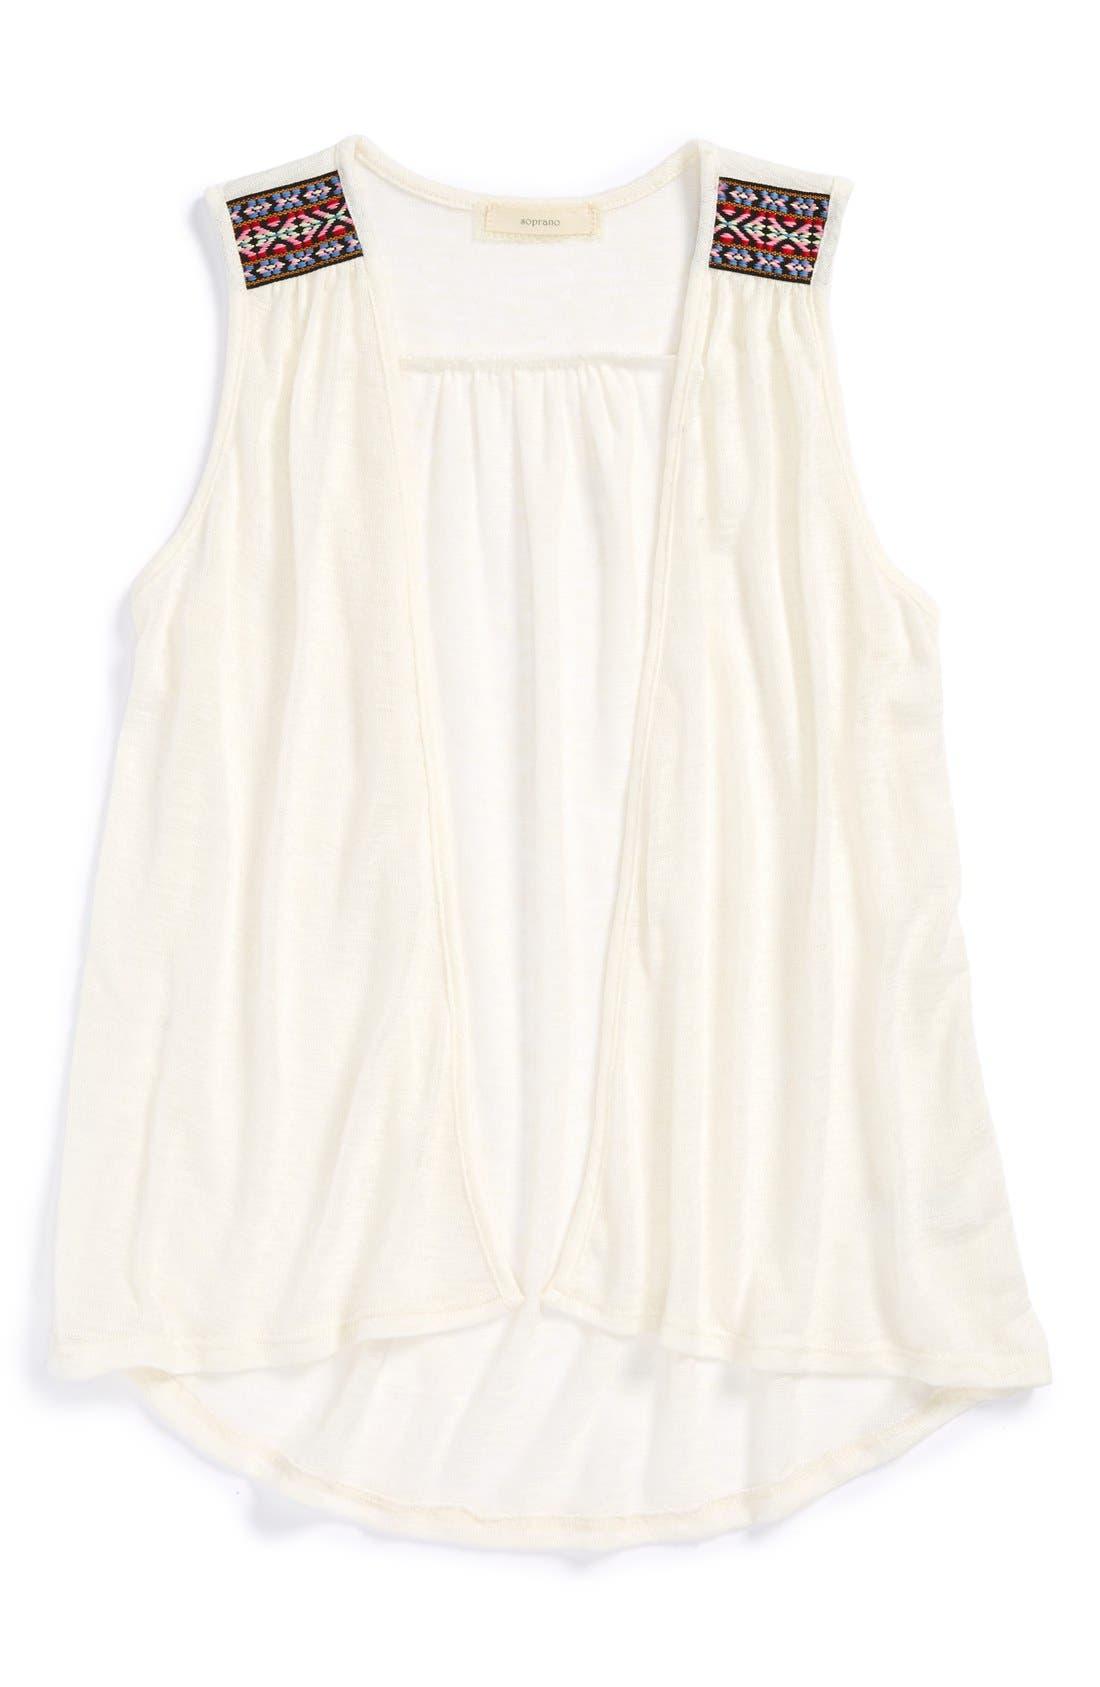 Alternate Image 1 Selected - Soprano Sleeveless Vest (Big Girls)